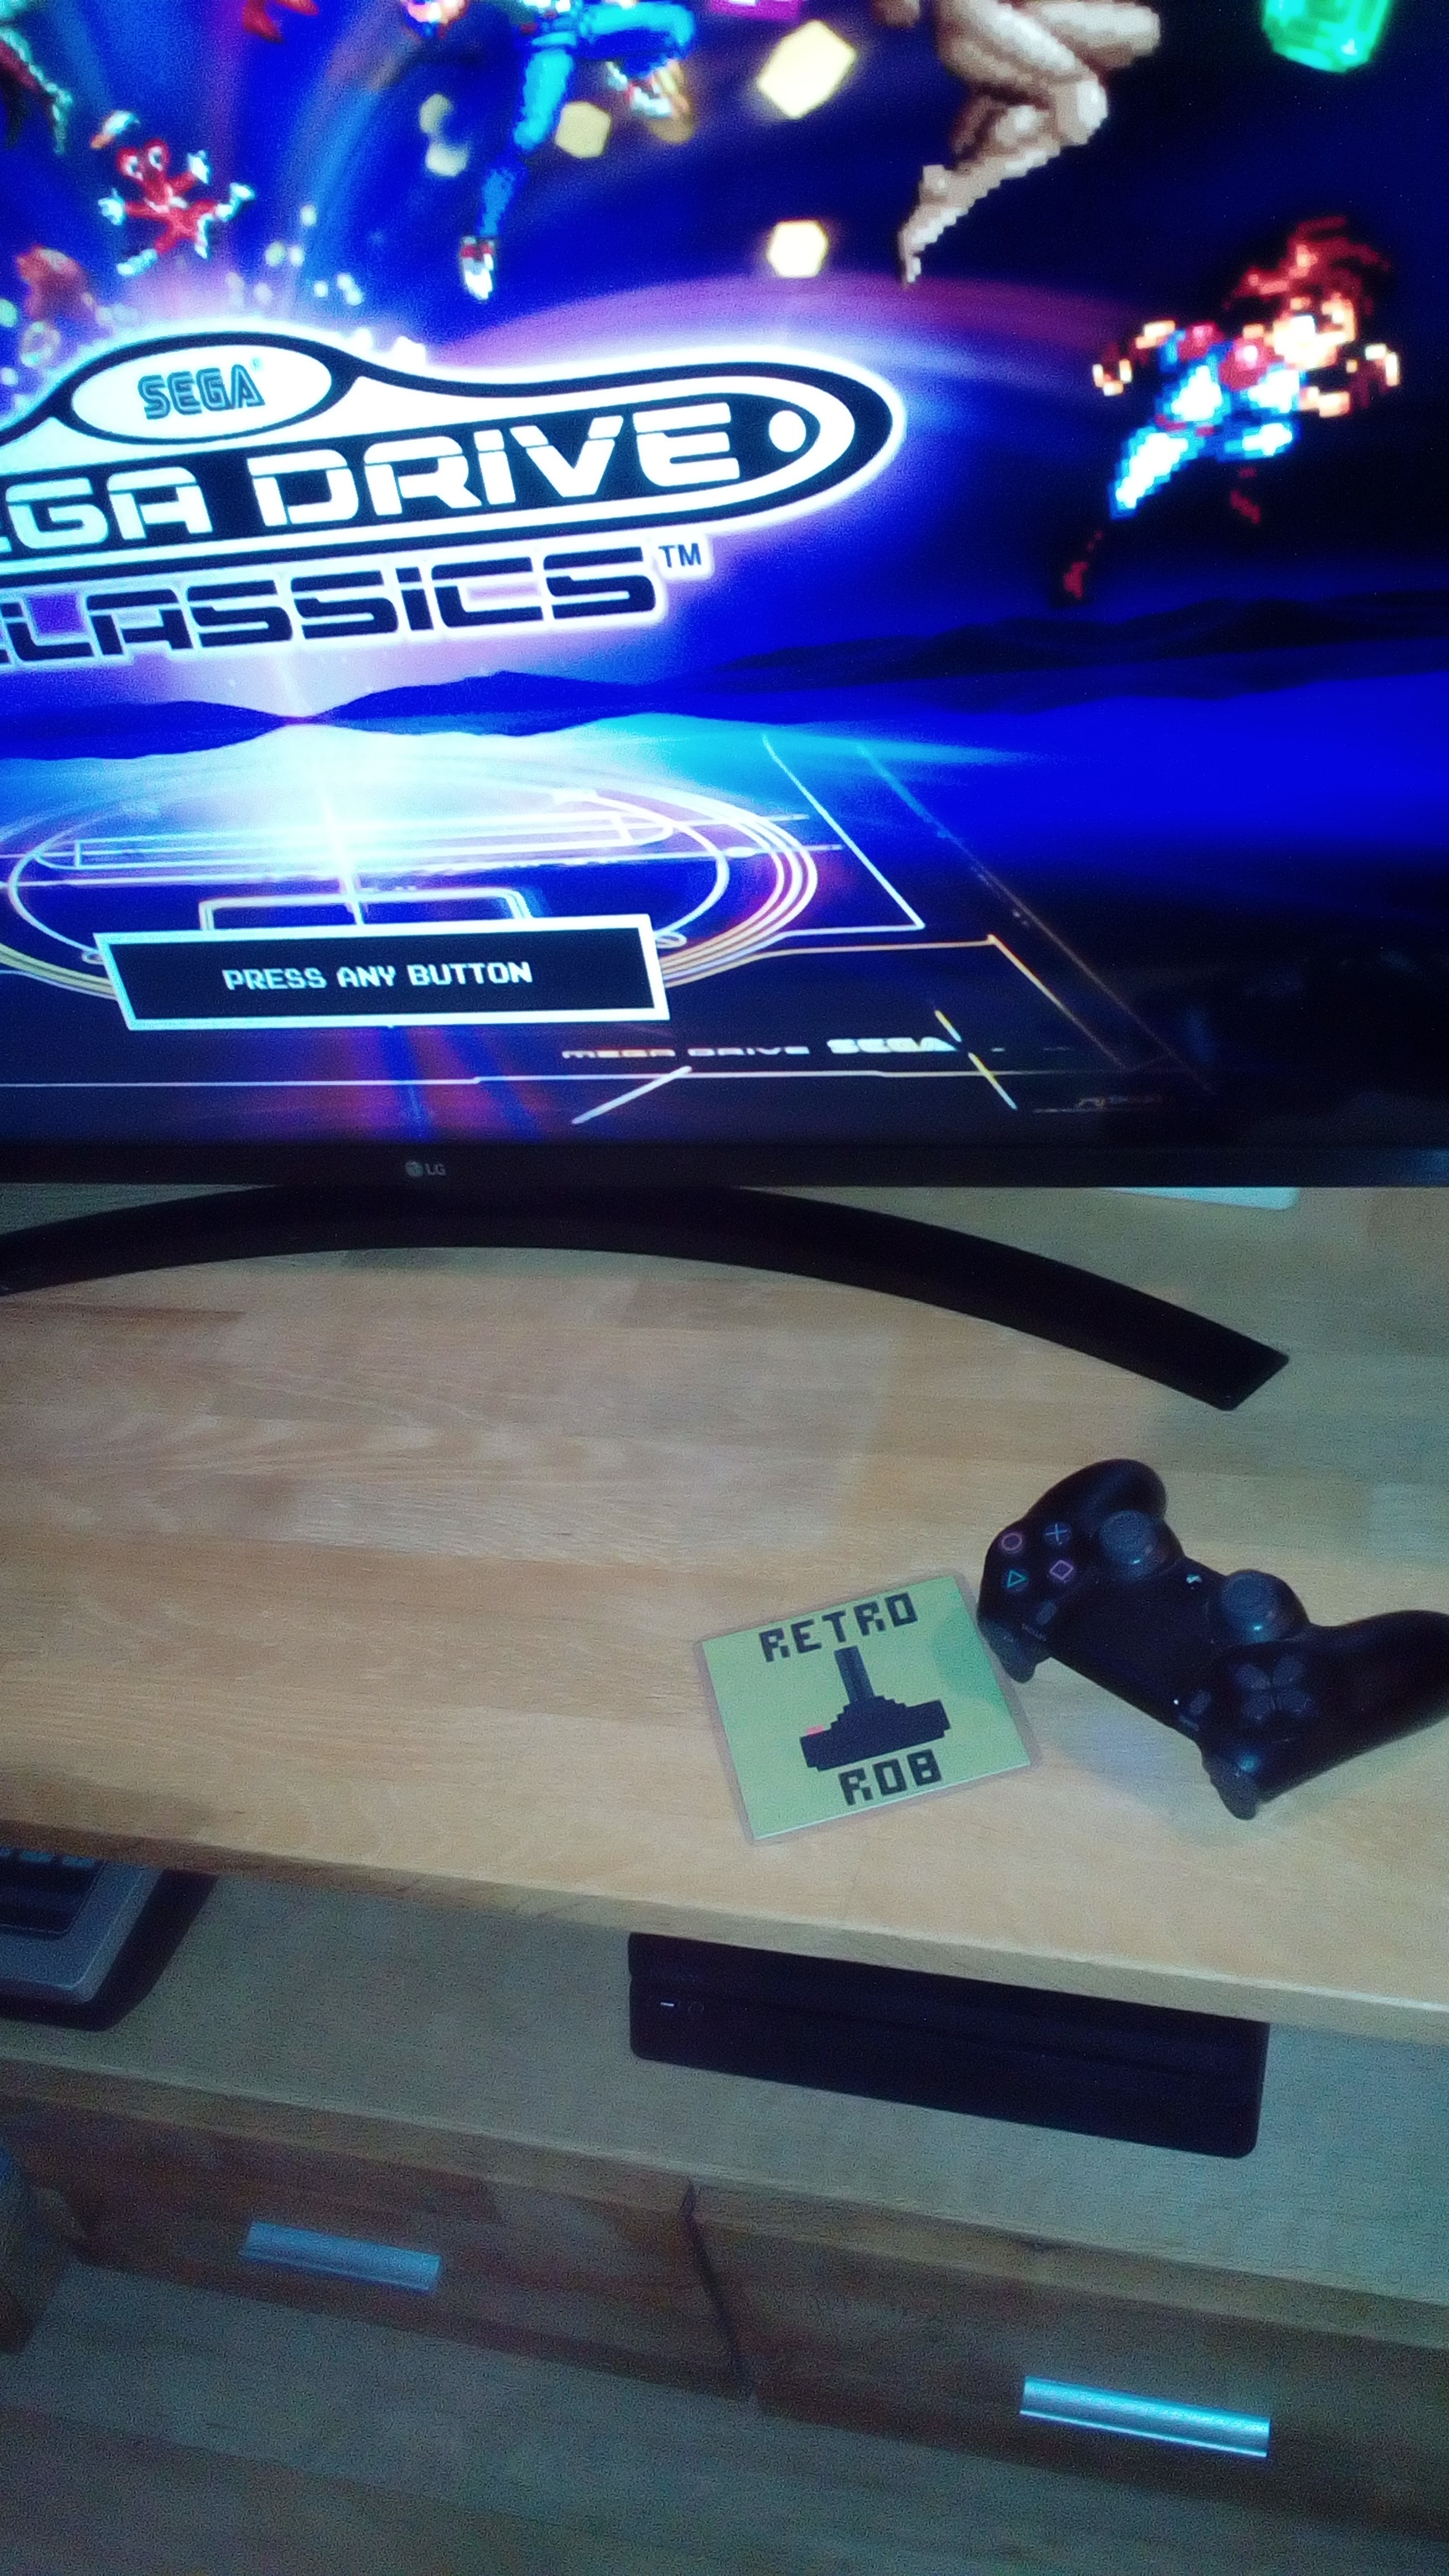 RetroRob: Sega Genesis Classics: Bio-Hazard Battle [Easy] (Playstation 4) 7,630 points on 2020-08-28 15:14:00